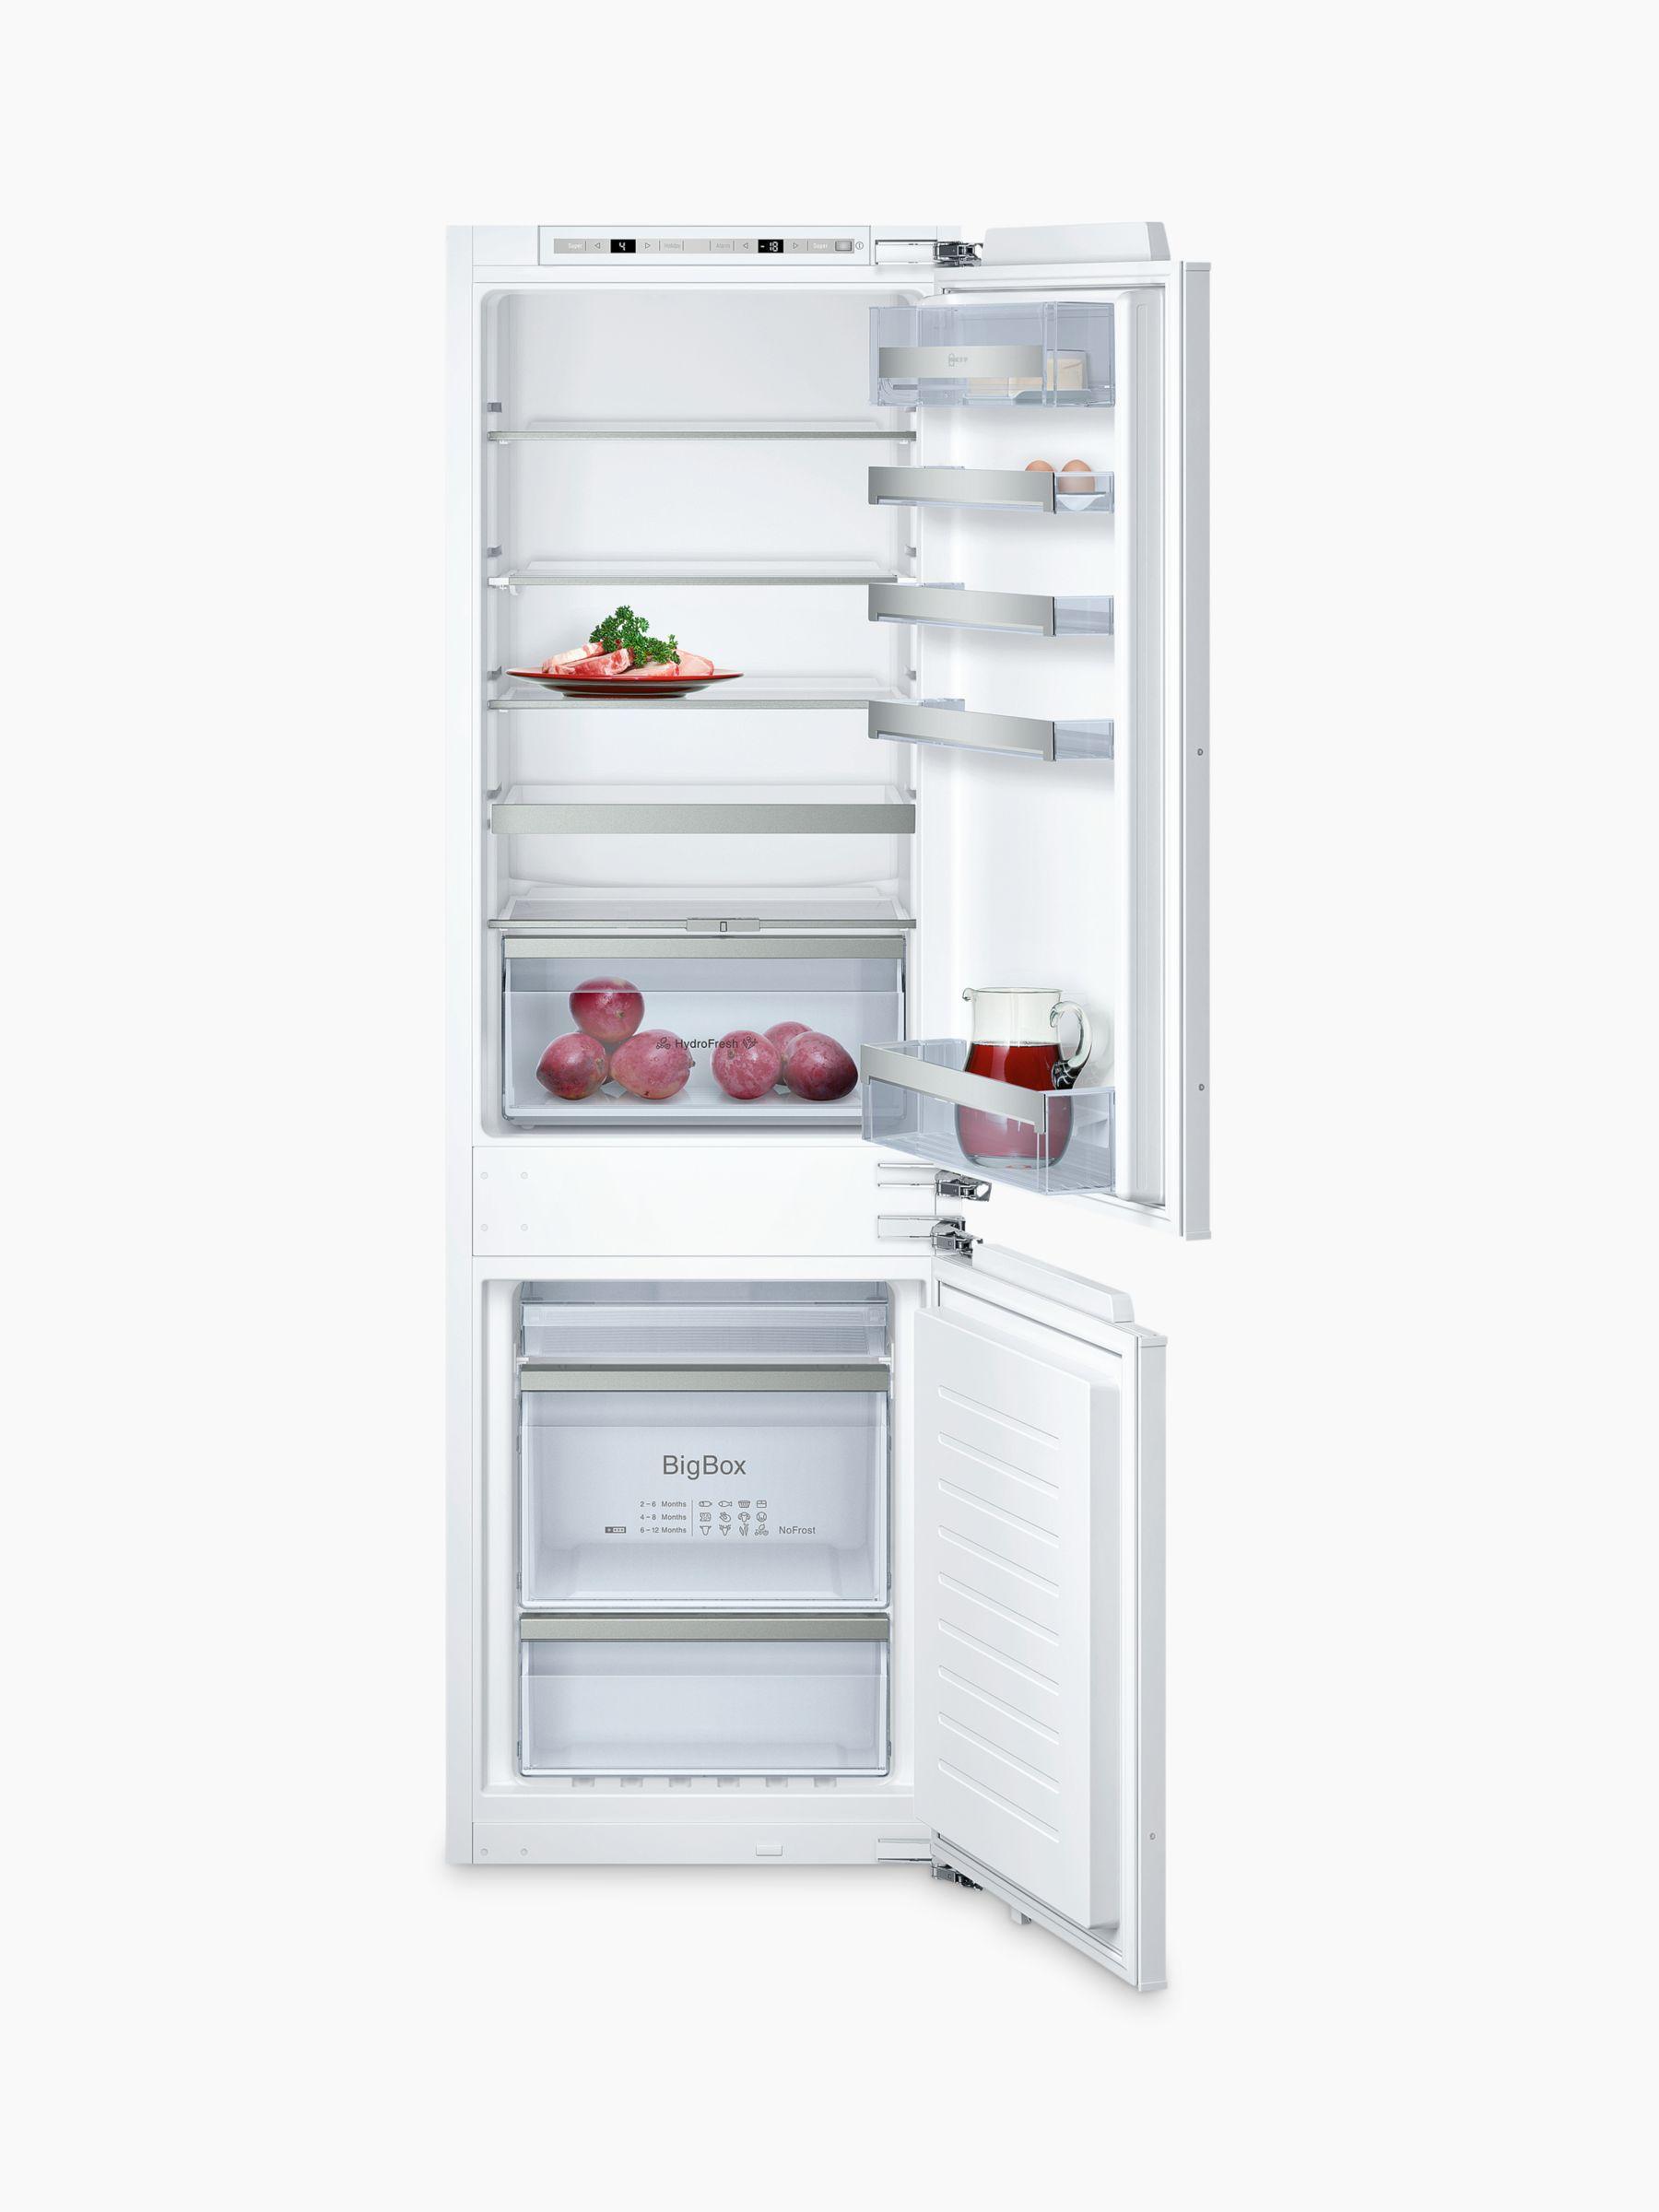 NEFF Neff KI7863D30G Integrated Fridge Freezer, A++ Energy Rating, 55cm Wide